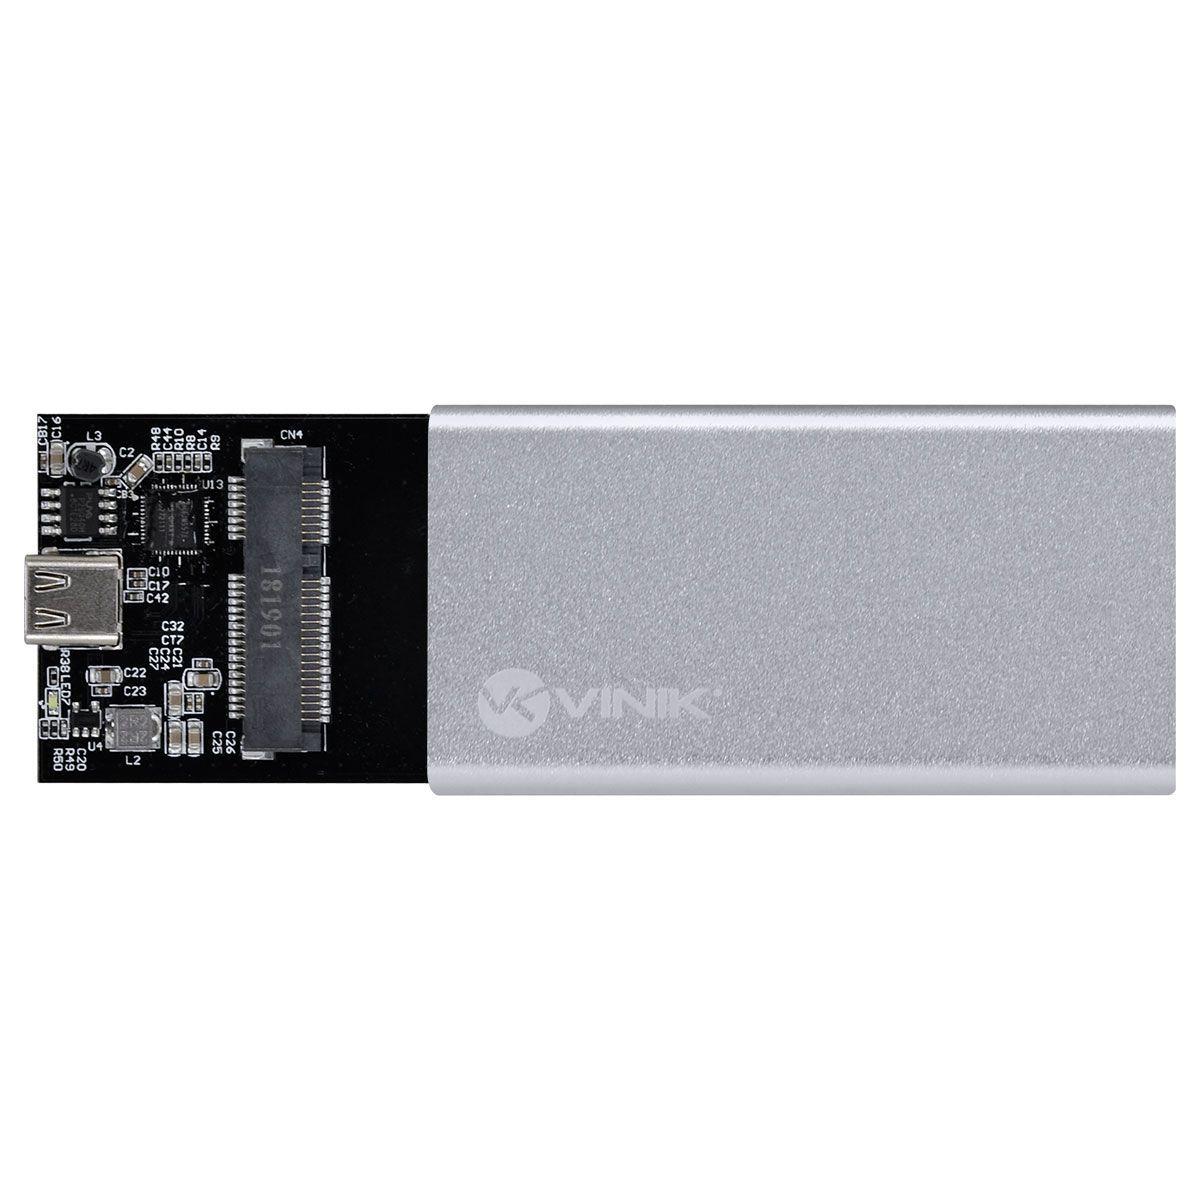 Case para SSD mSATA USB 3.1 Tipo C 10Gpbs - Vinik CS25-A31